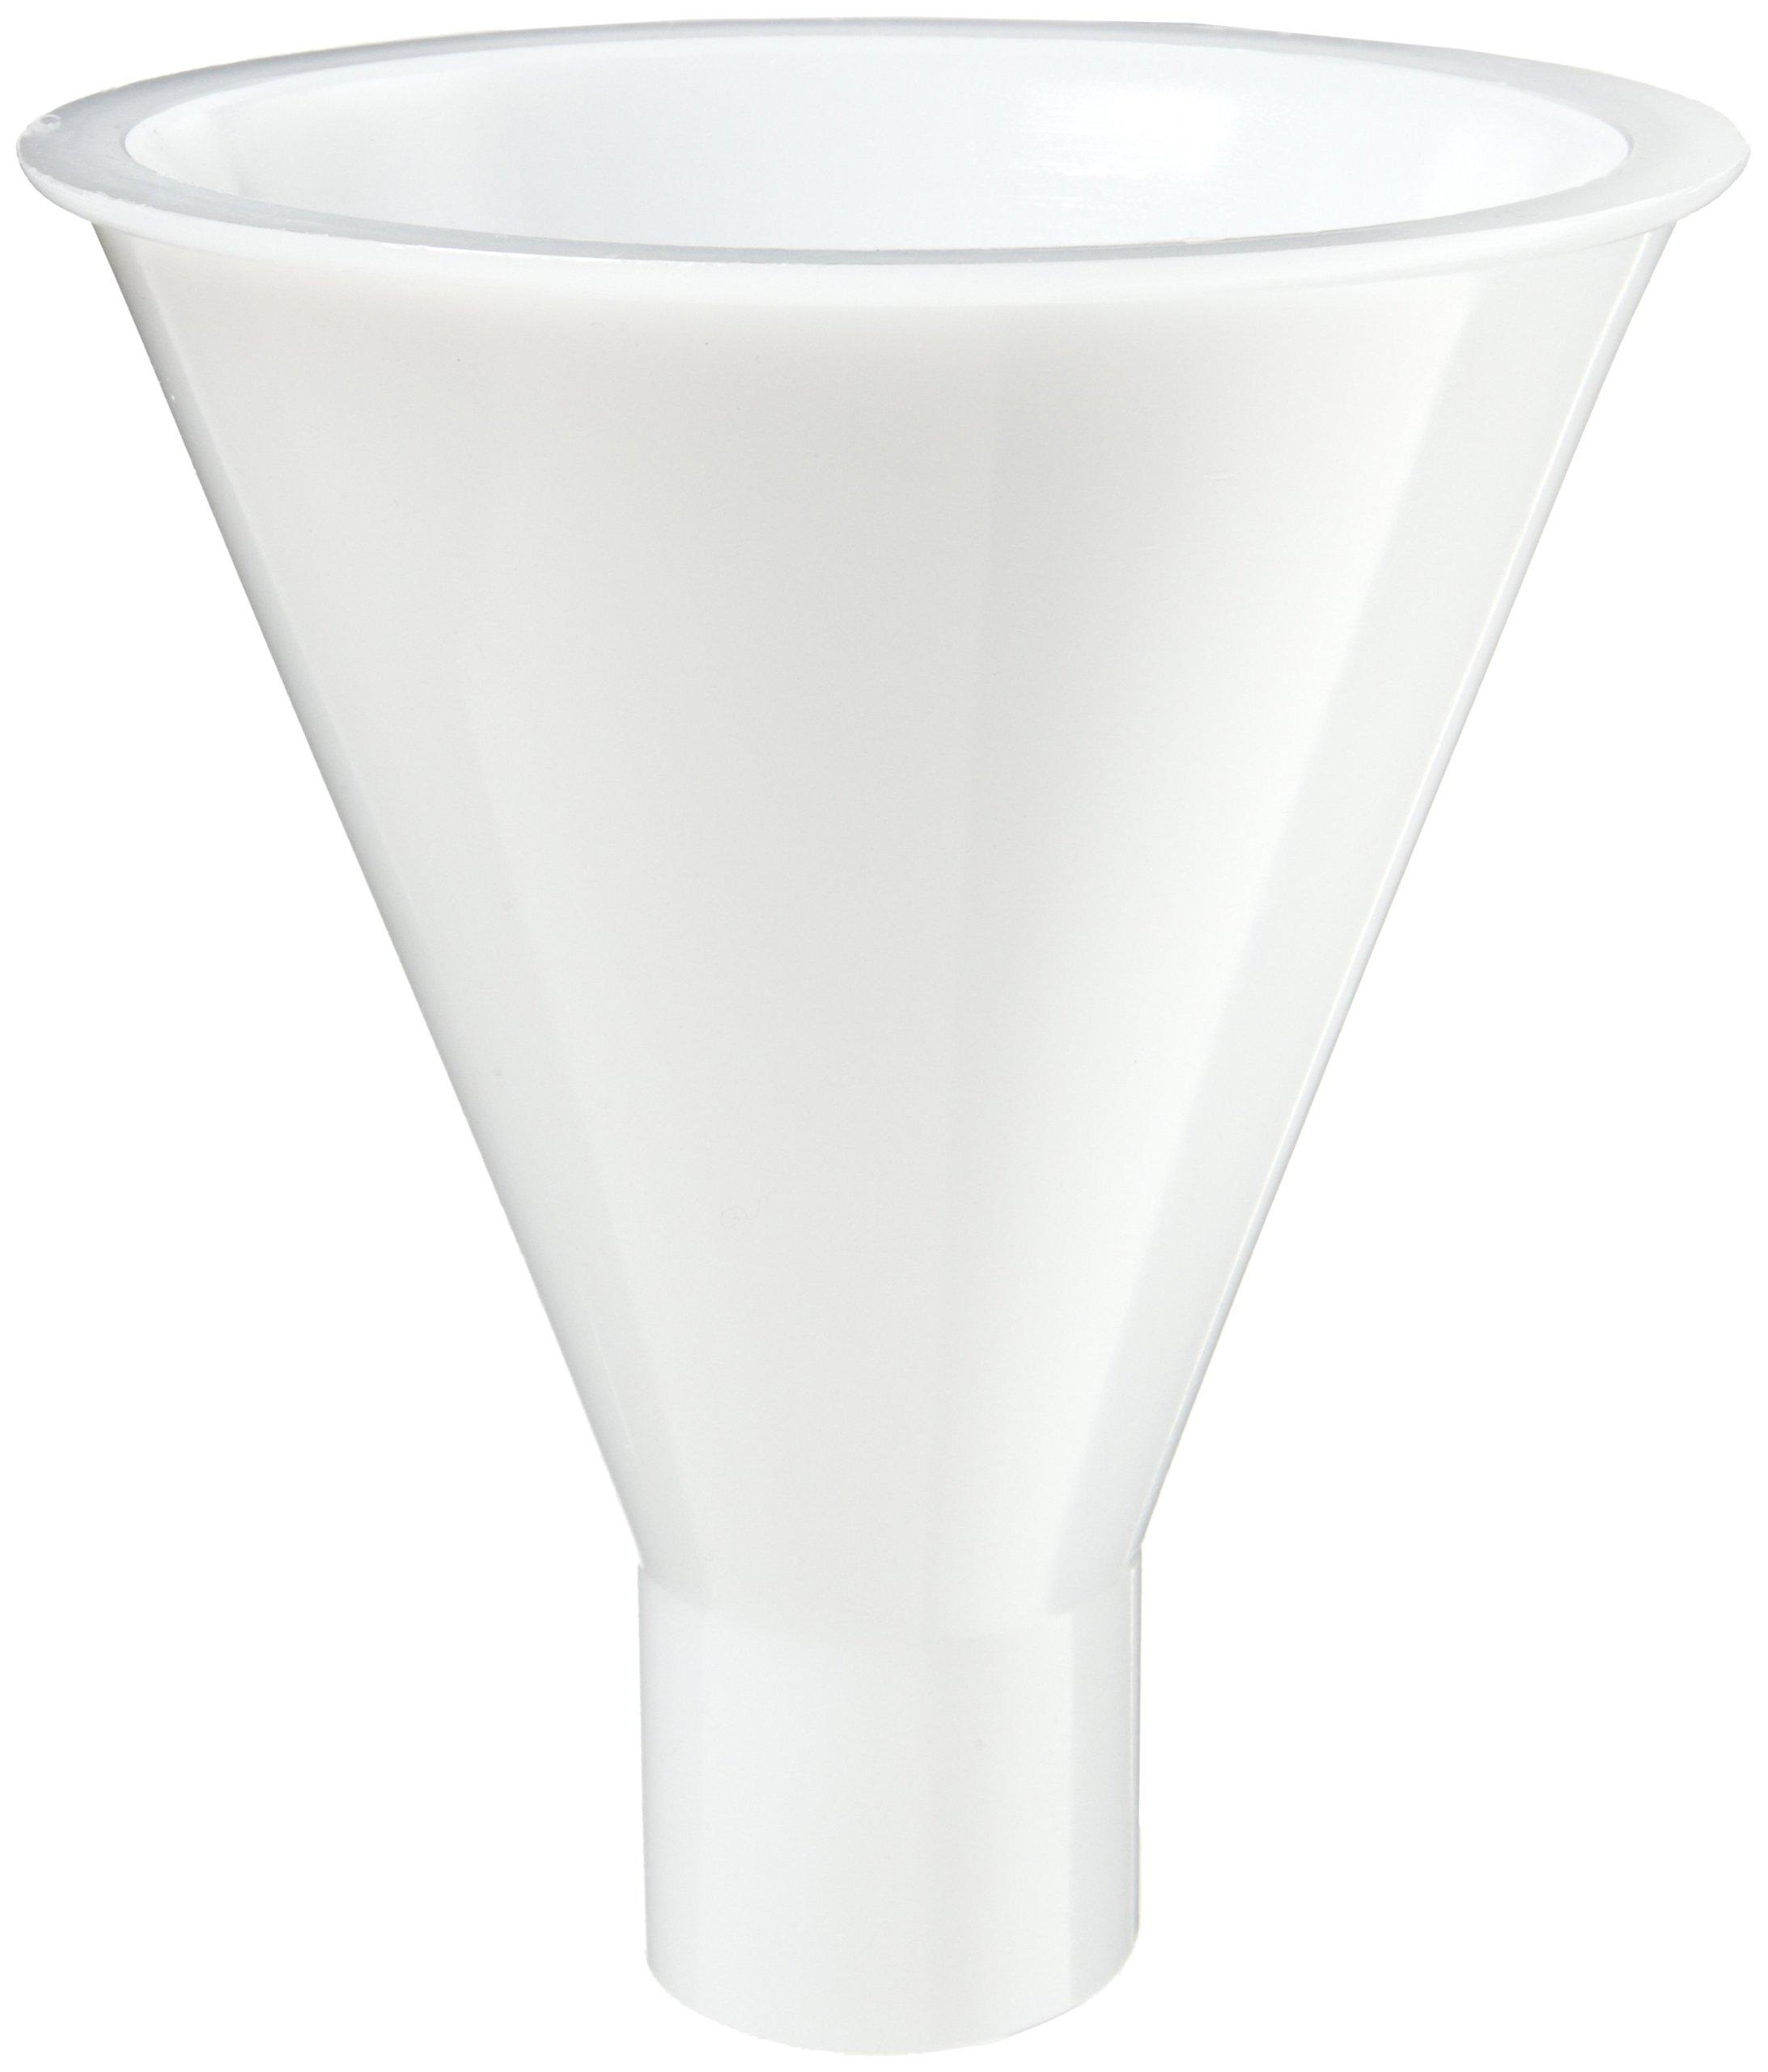 Bel-Art Polyethylene 510ml Large Powder Funnel (H14684-0000)